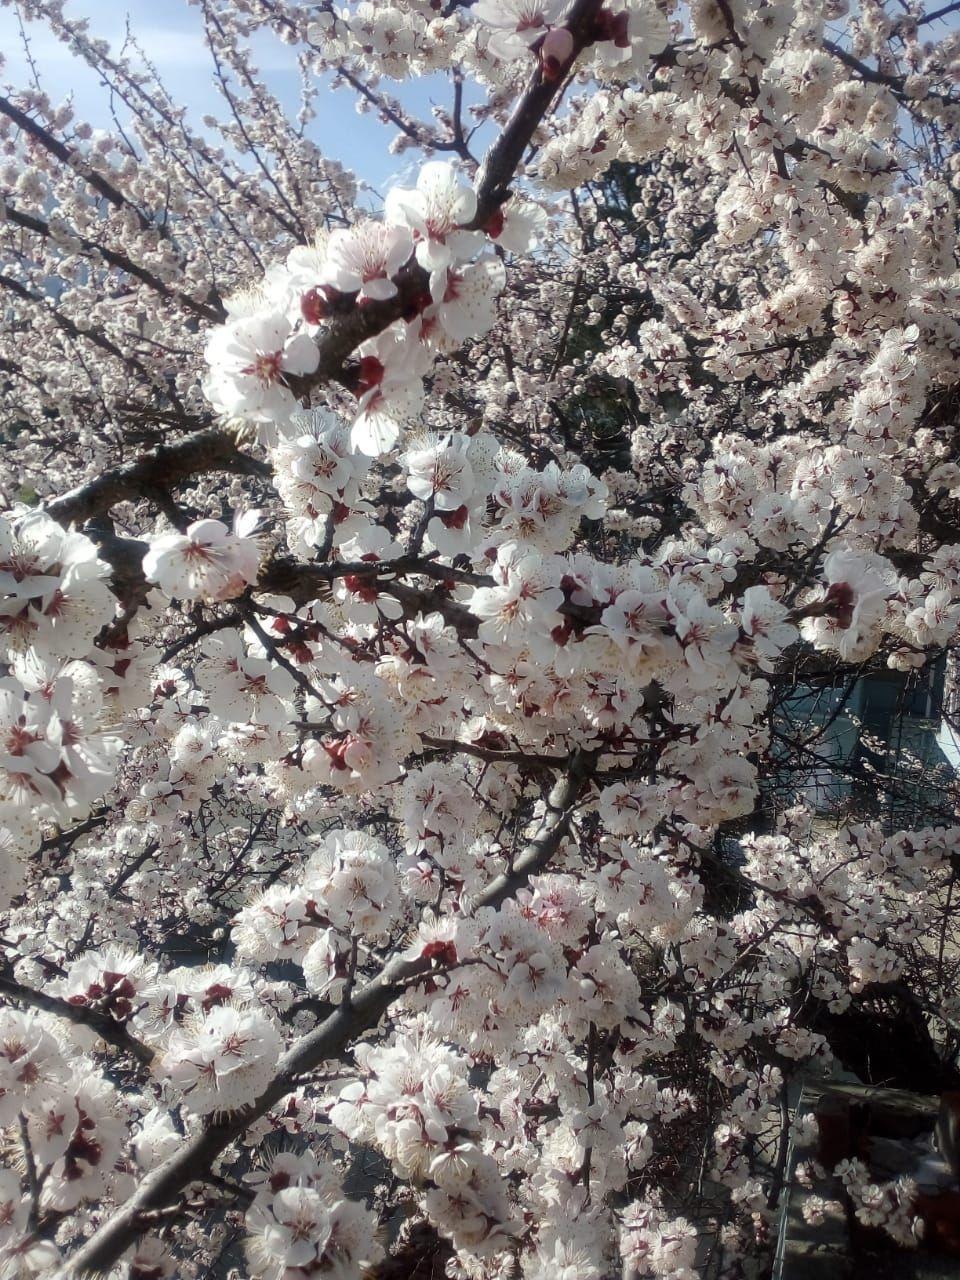 Trees blossoming | Kinnaurappletraders